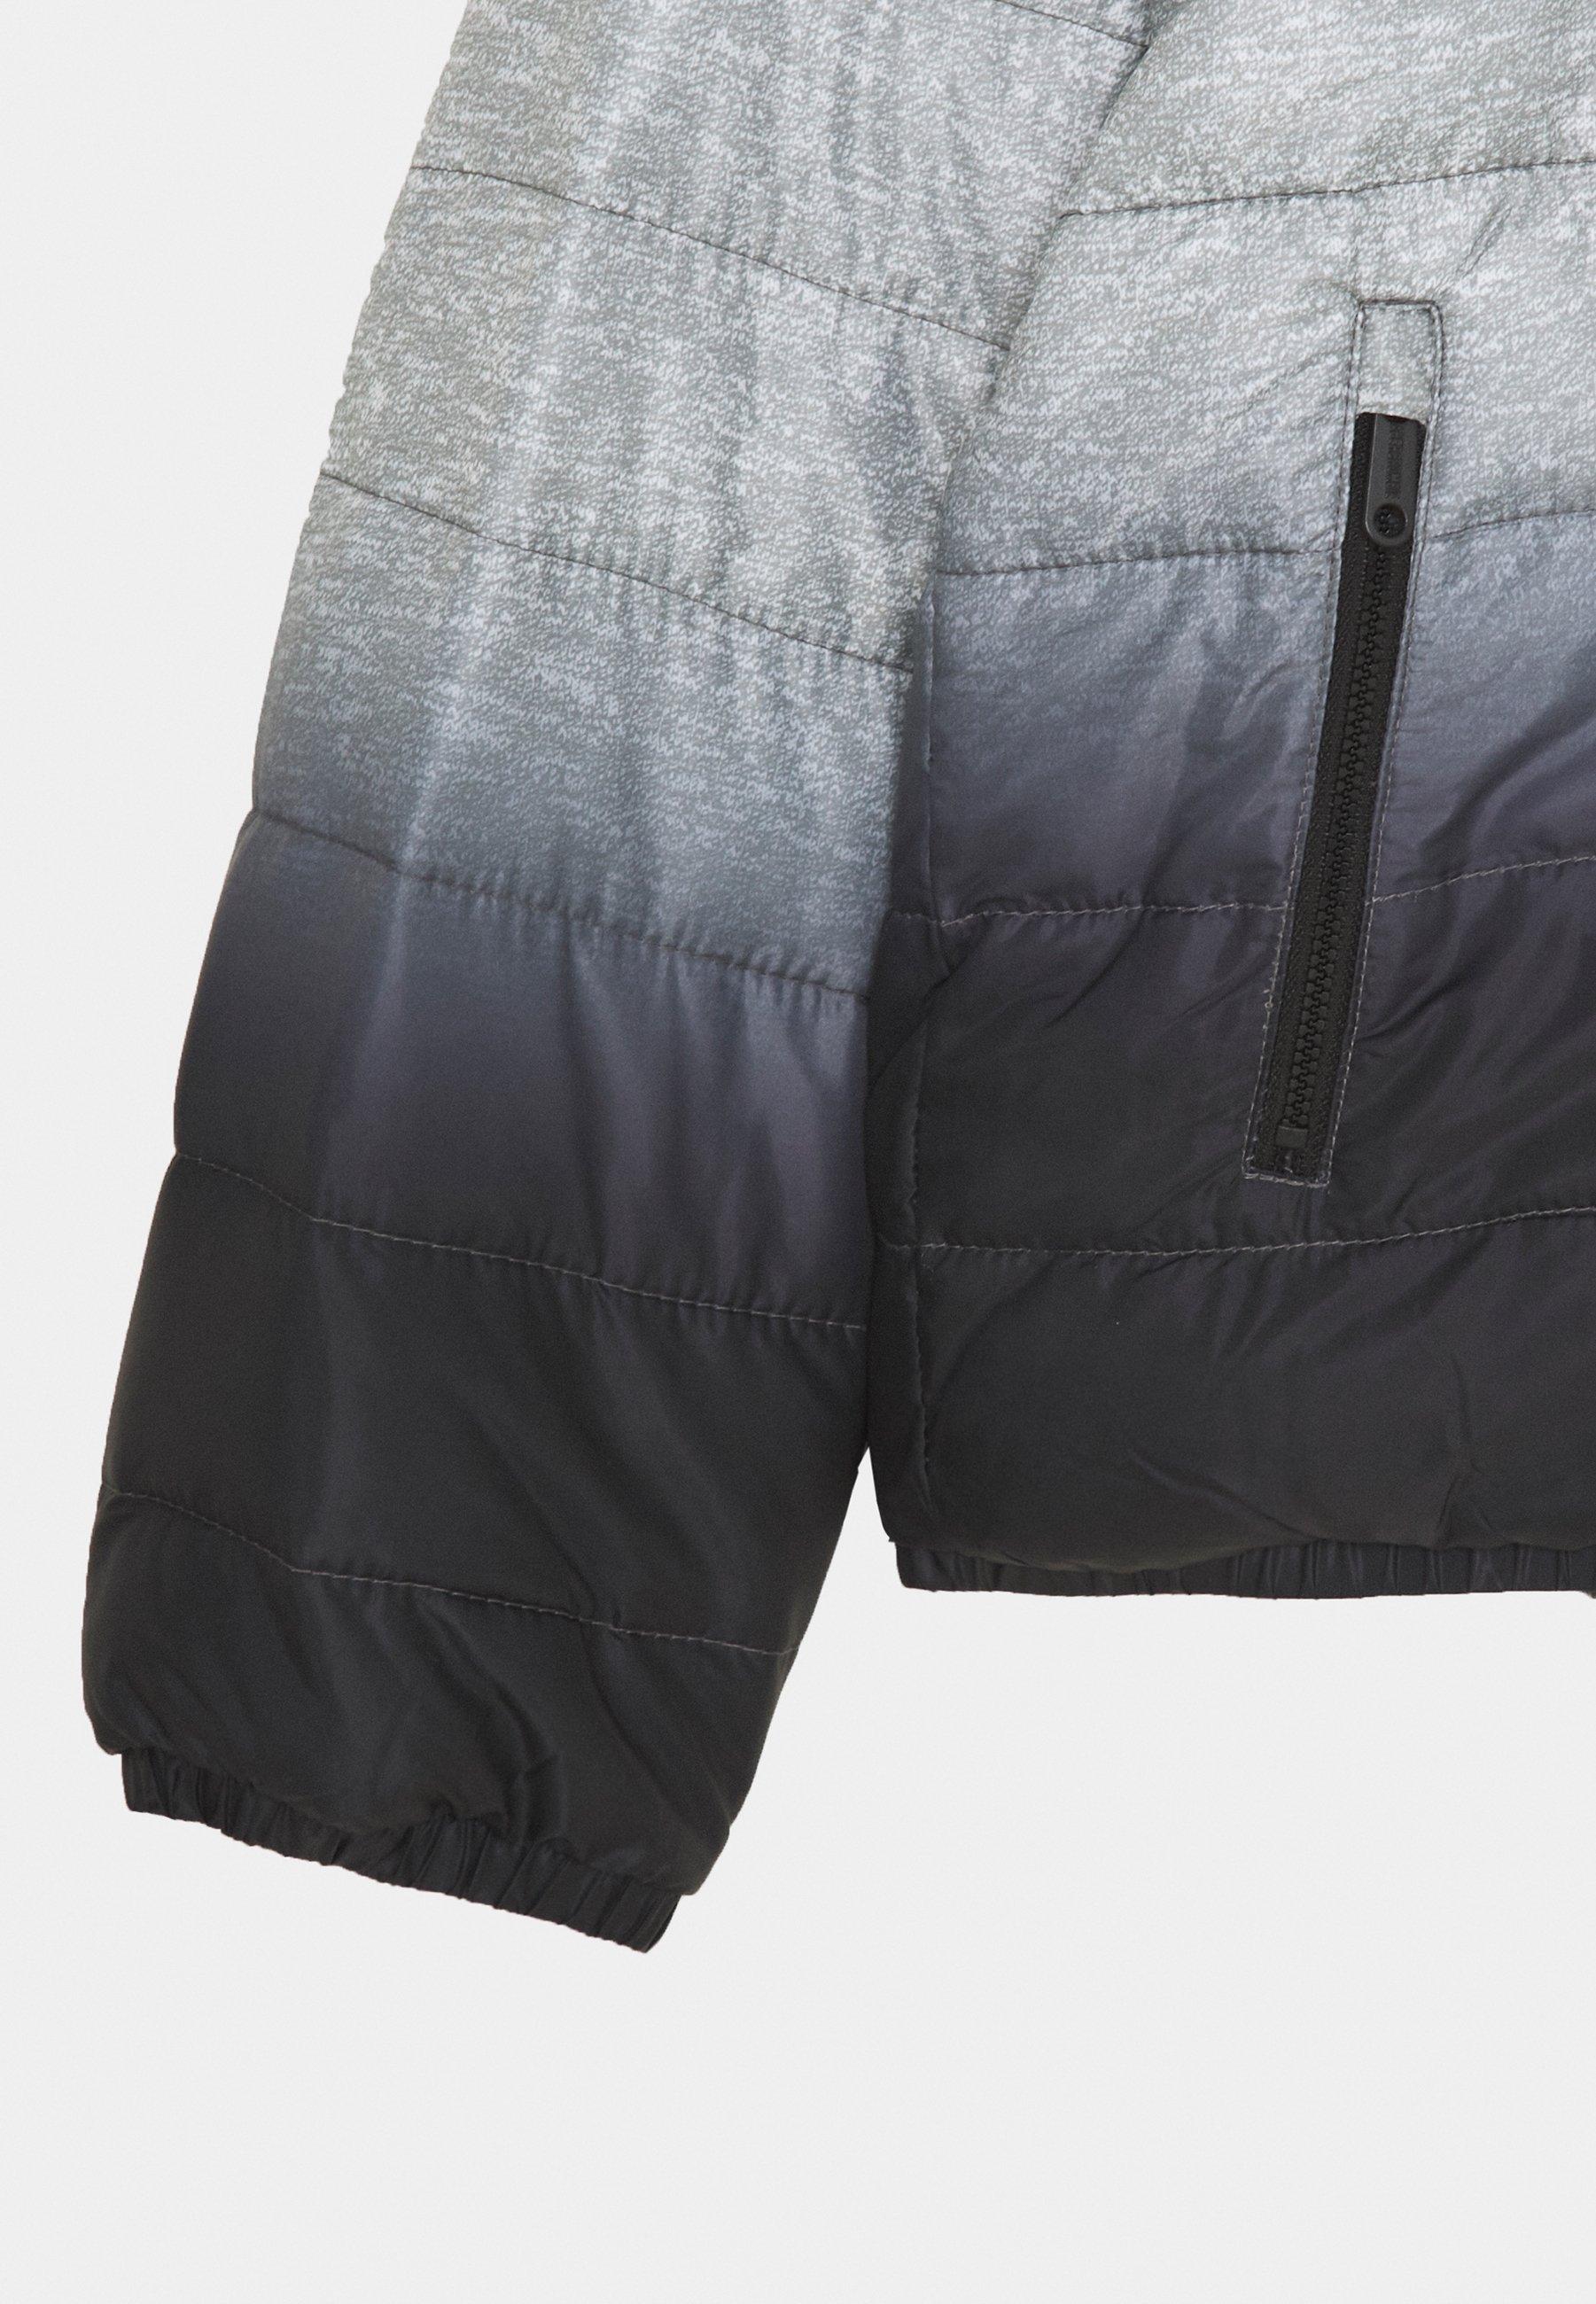 Abercrombie & Fitch Cozy Puffer - Chaqueta De Invierno Grey/black